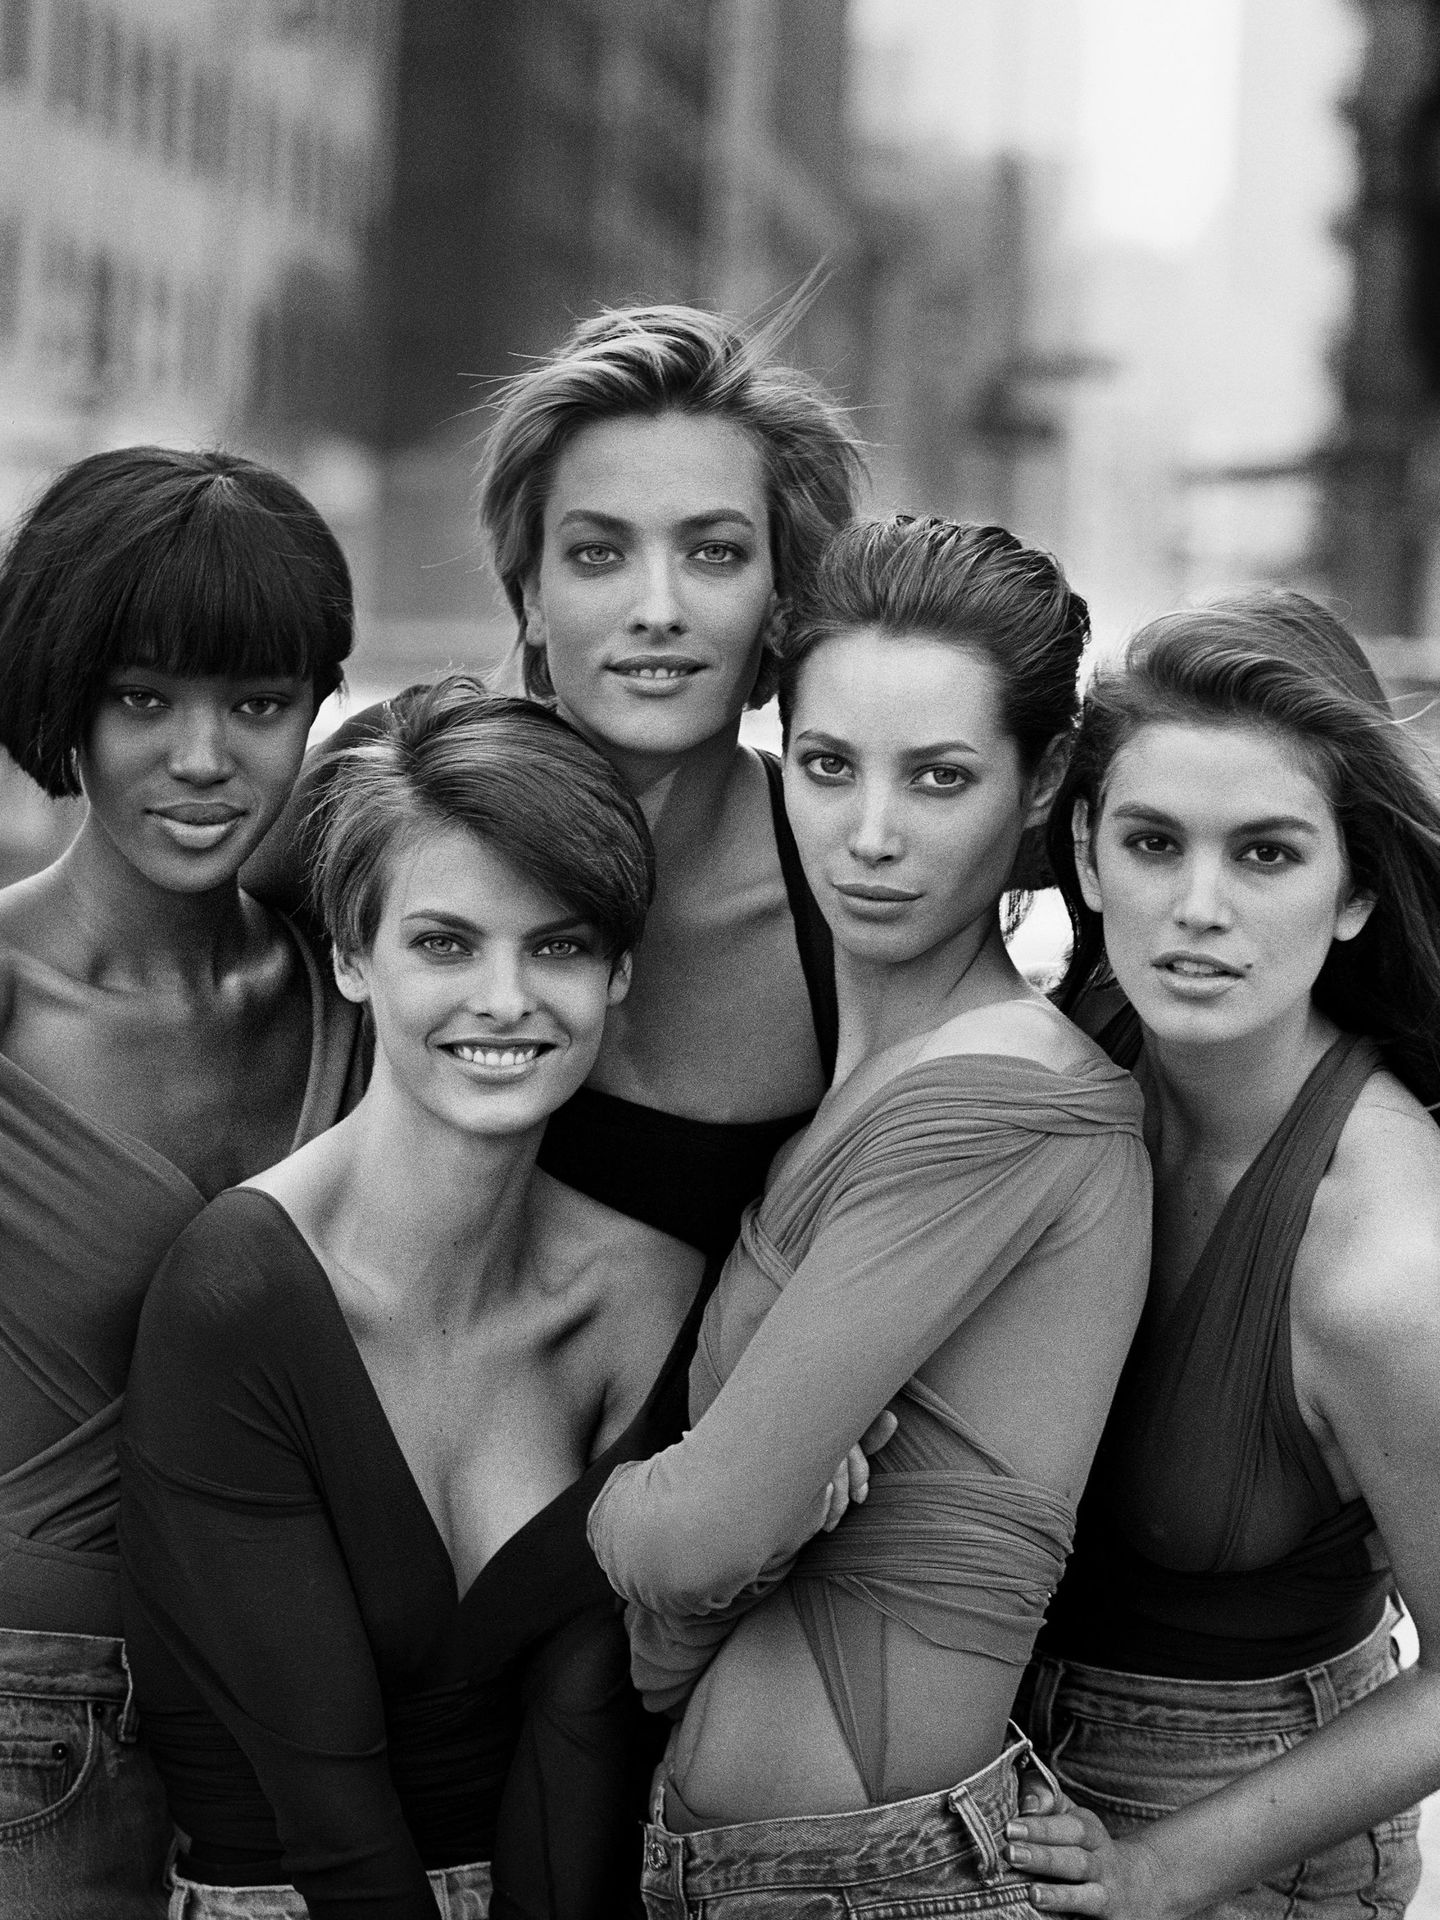 Naomi Campbell, Linda Evangelista, Tatjana Patitz, Christy Turlington y Cindy Crawford, fotografiadas por Peter Lindbergh. (EFE)